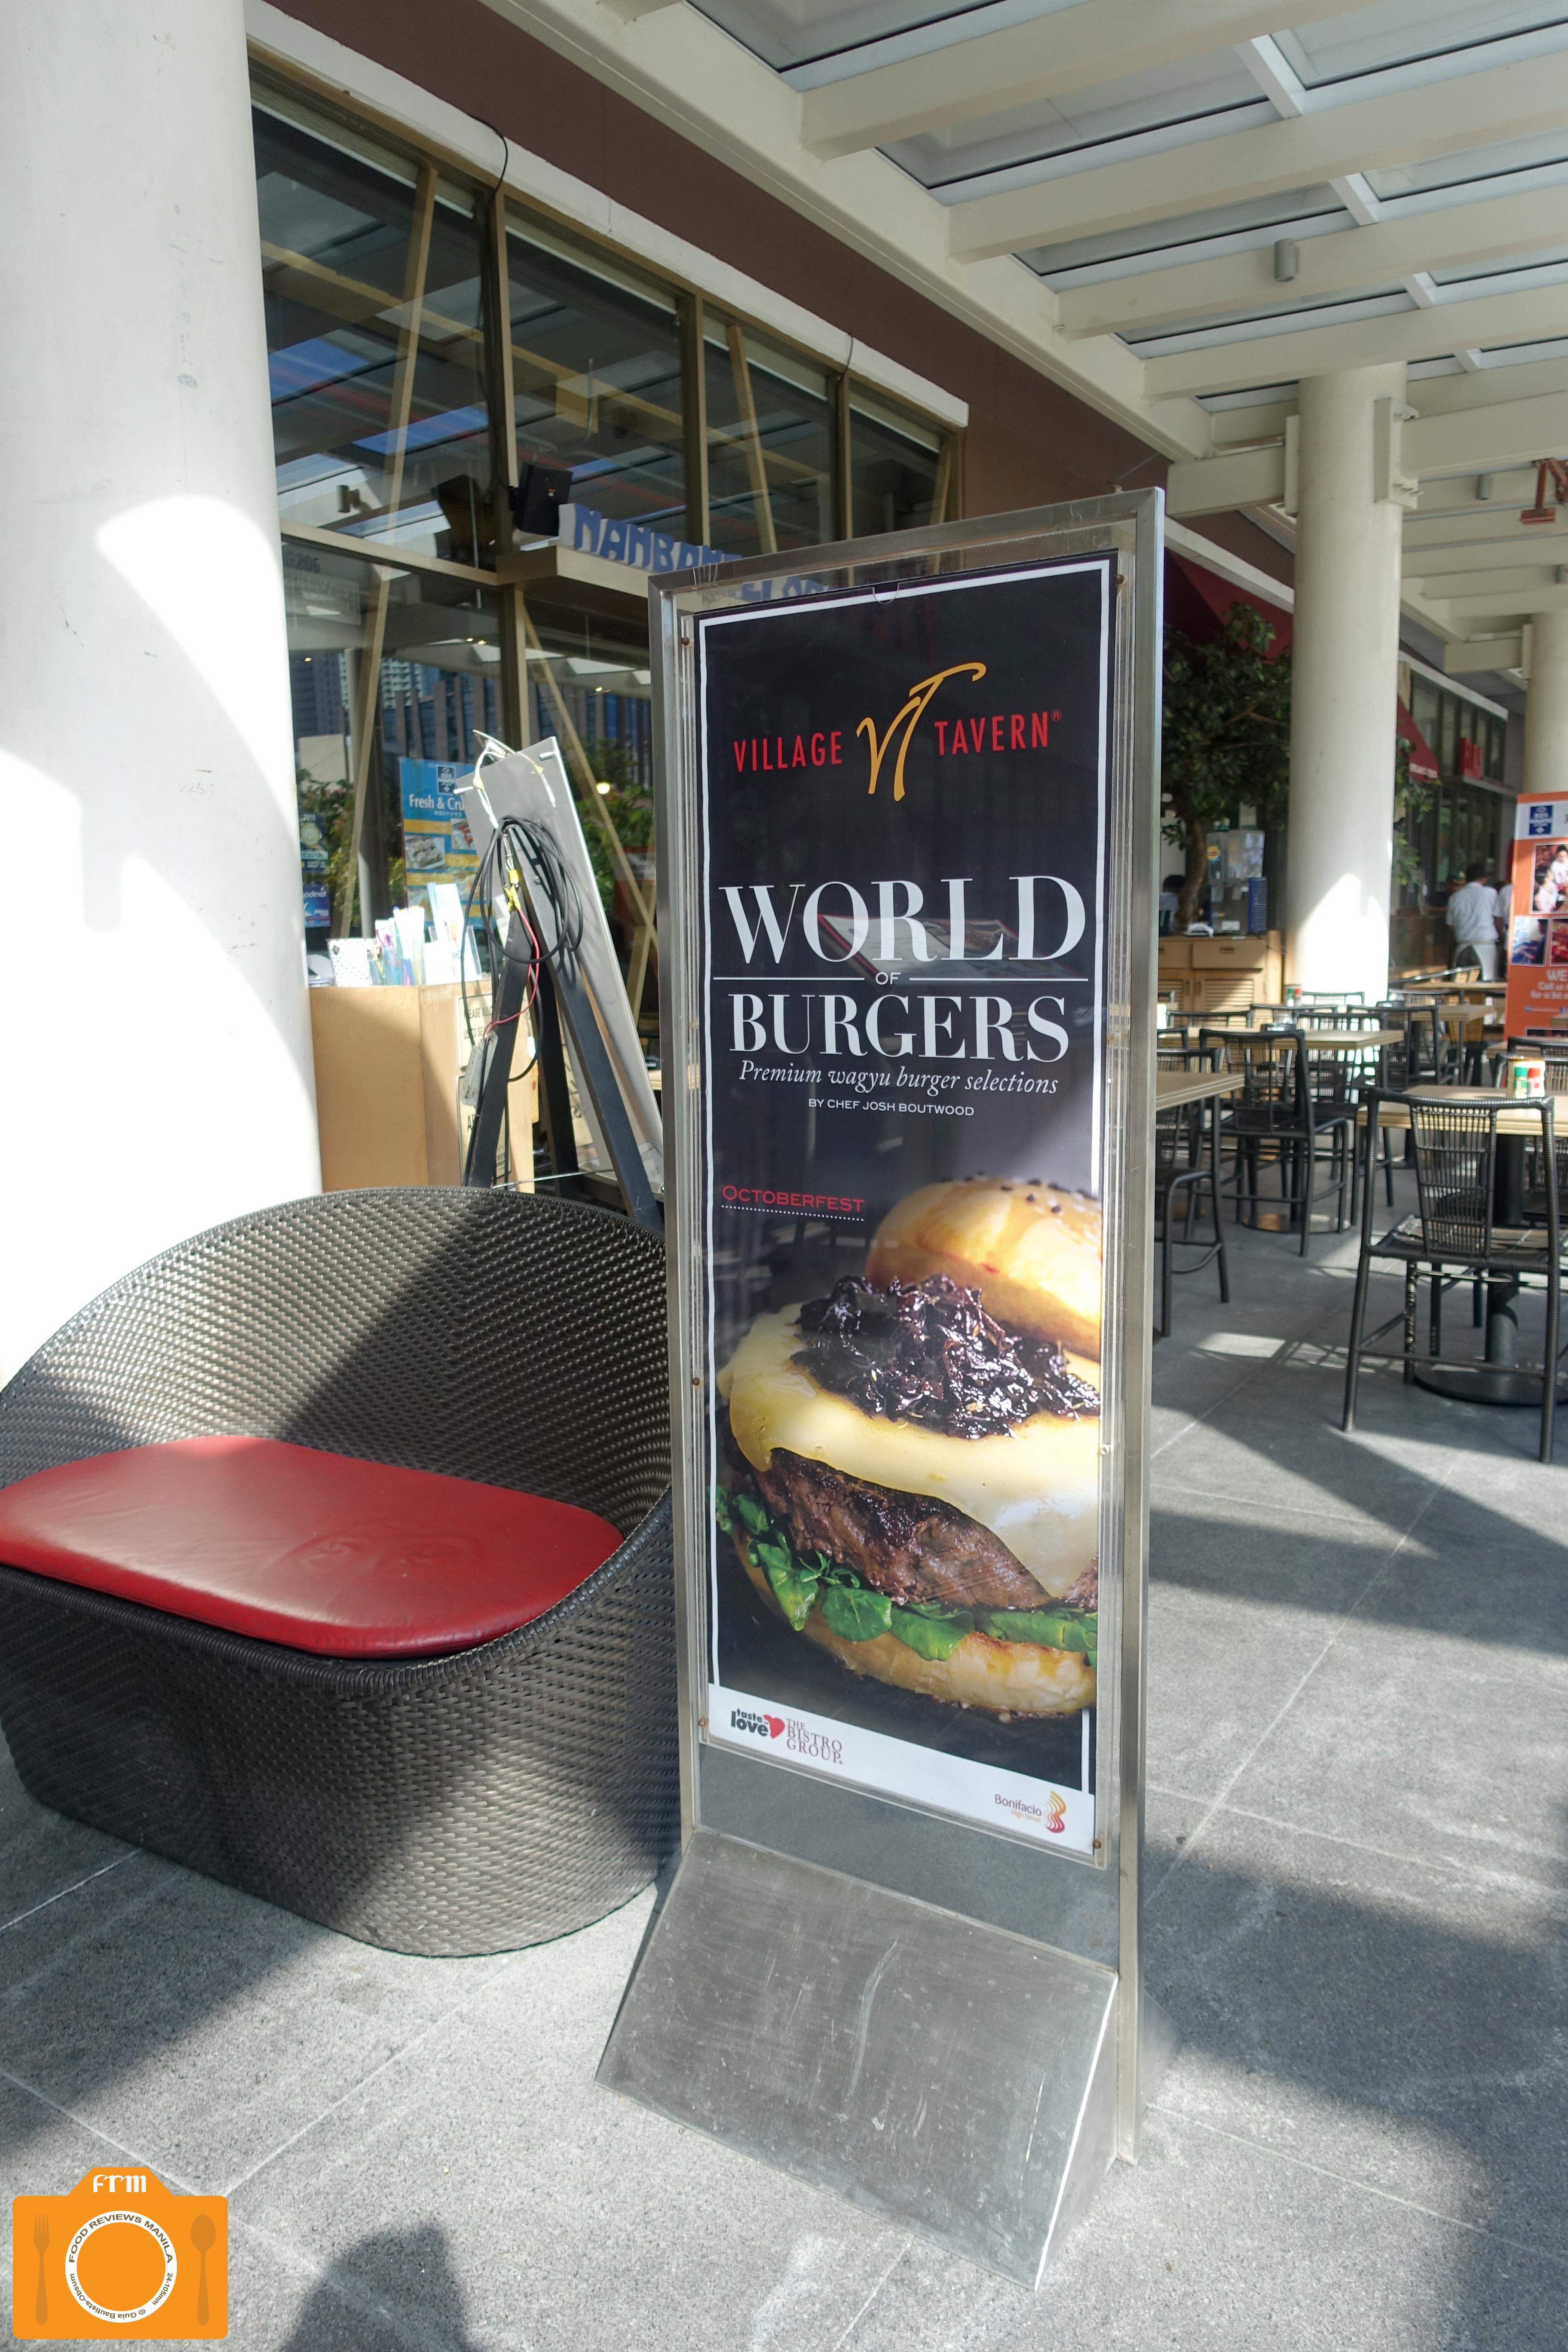 Village Tavern burger poster